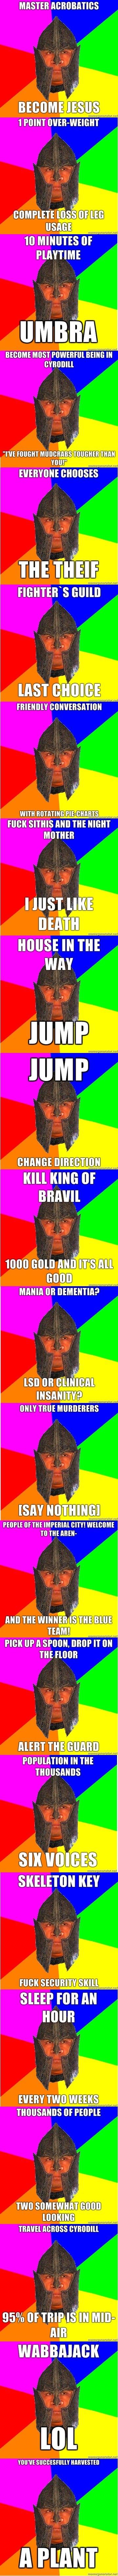 The Elder Scrolls, Oblivion Meme 2. Shouts to Mightymilk, OriginalTroll, and DobbieP for some ideas.<br /> Almost 100! Please folks!<br /> You can f Elder Scrolls oblivion meme